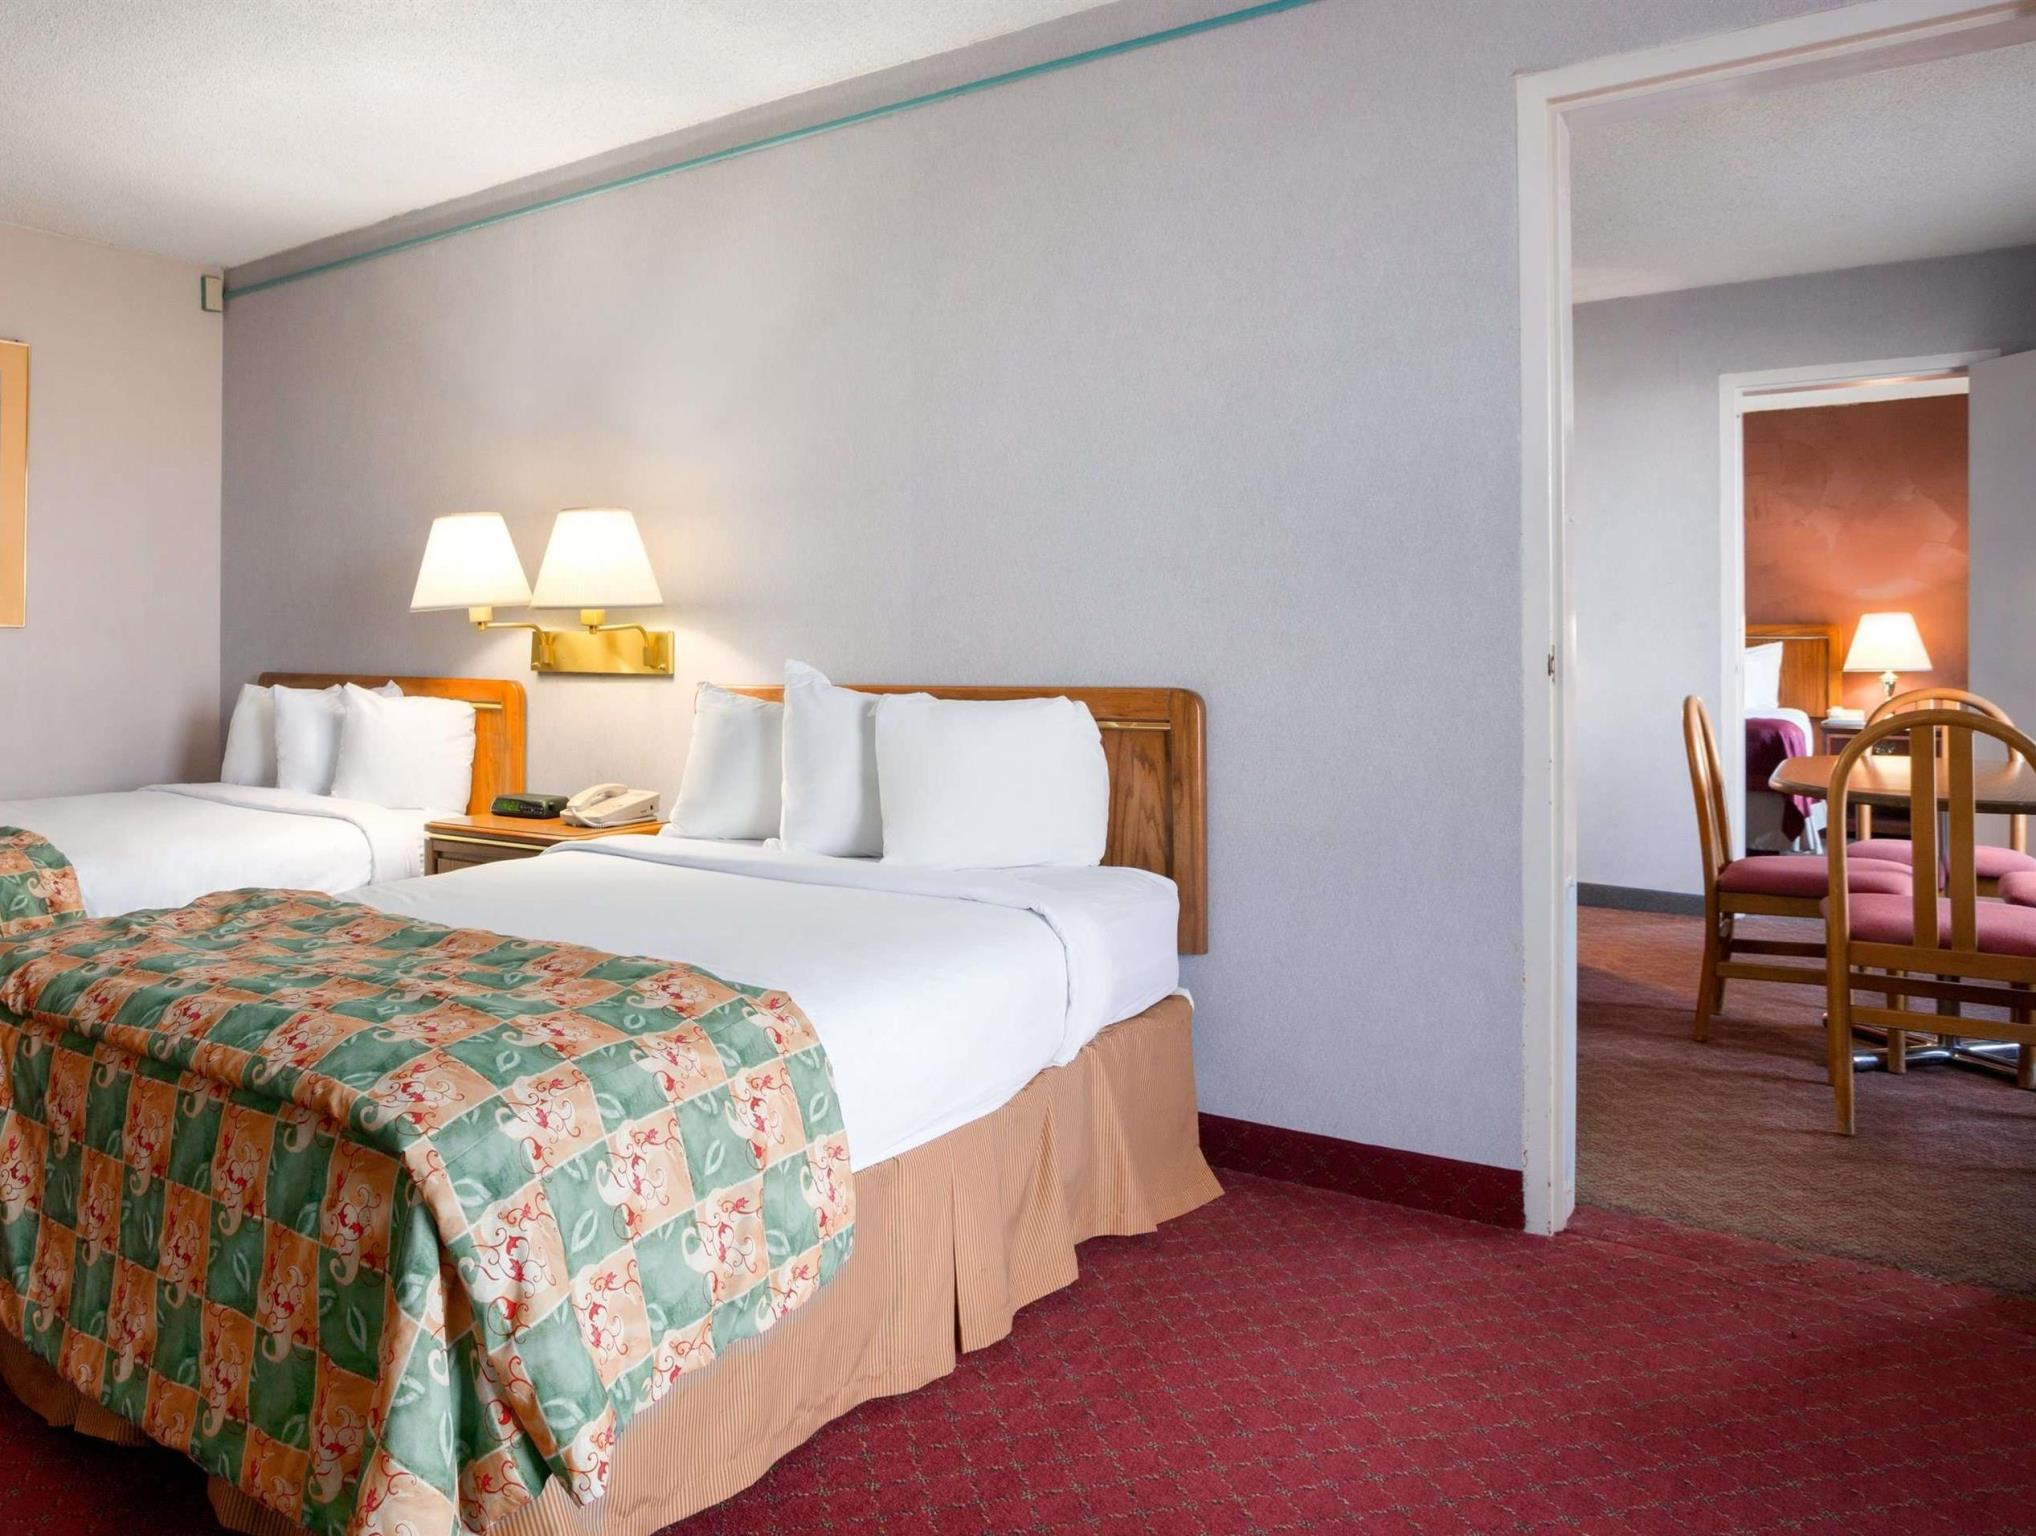 Days Inn And Suites By Wyndham Elyria